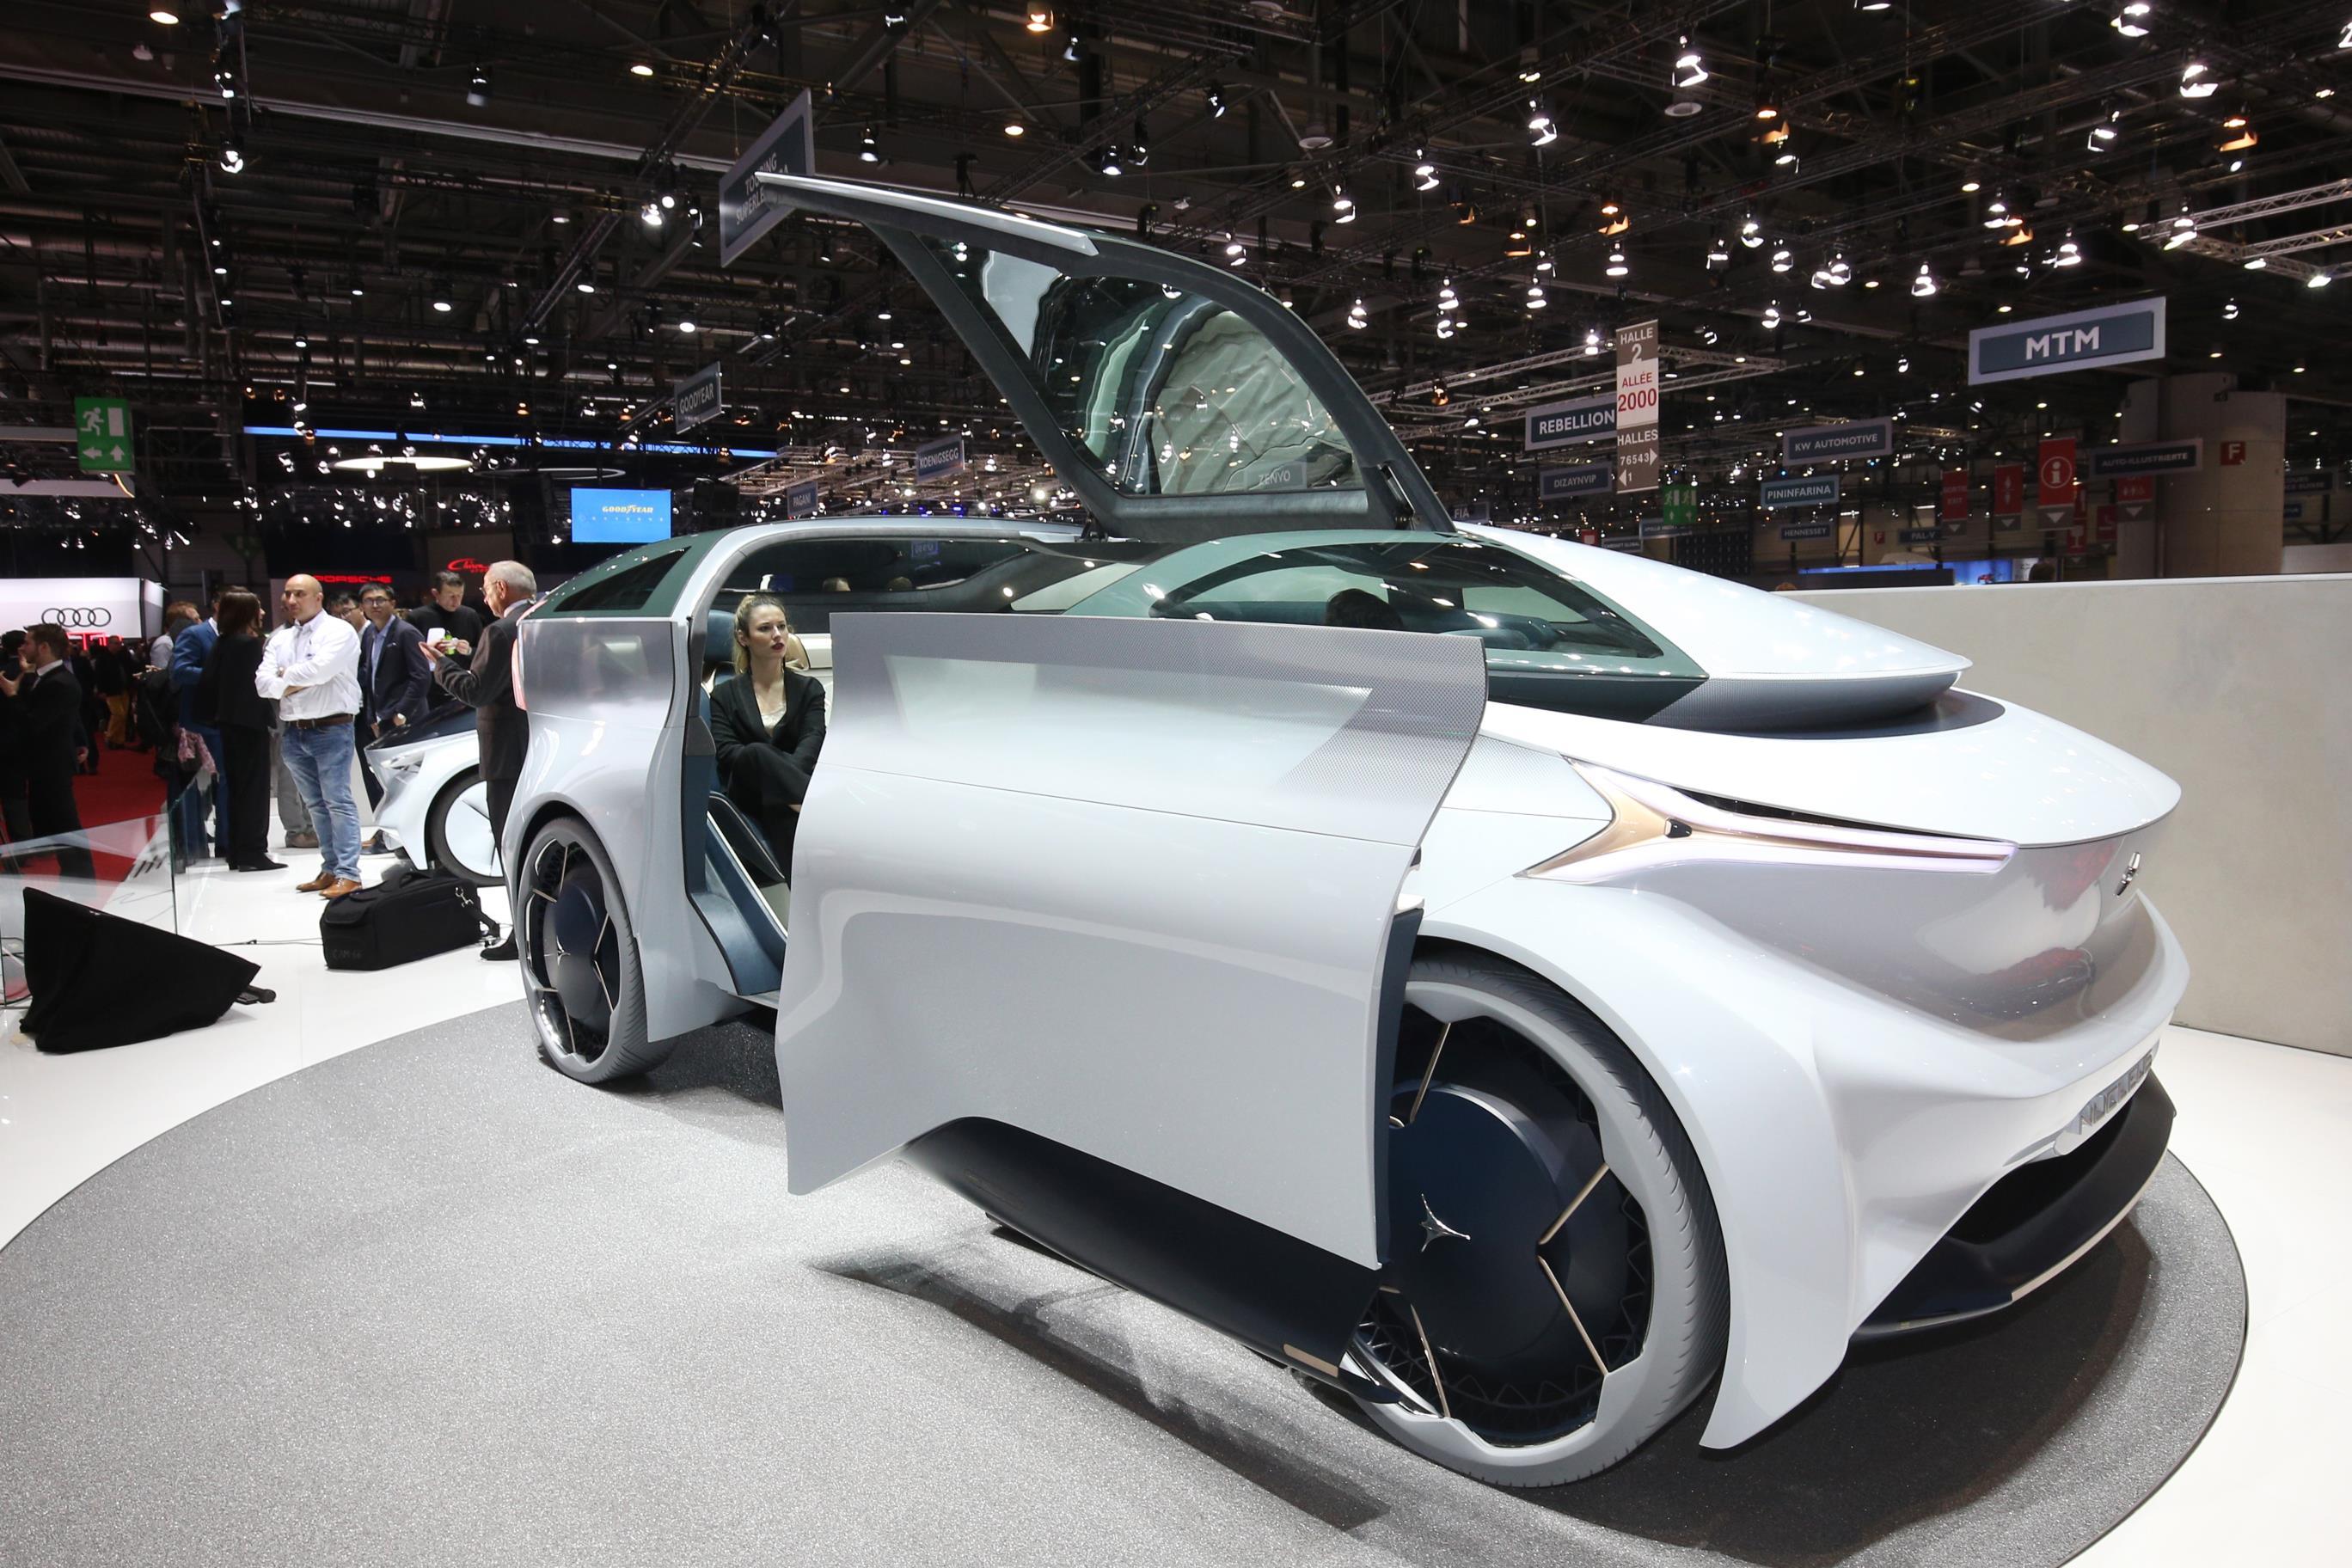 Geneva Motor Show 2018 Mega Gallery Part 1 (339)